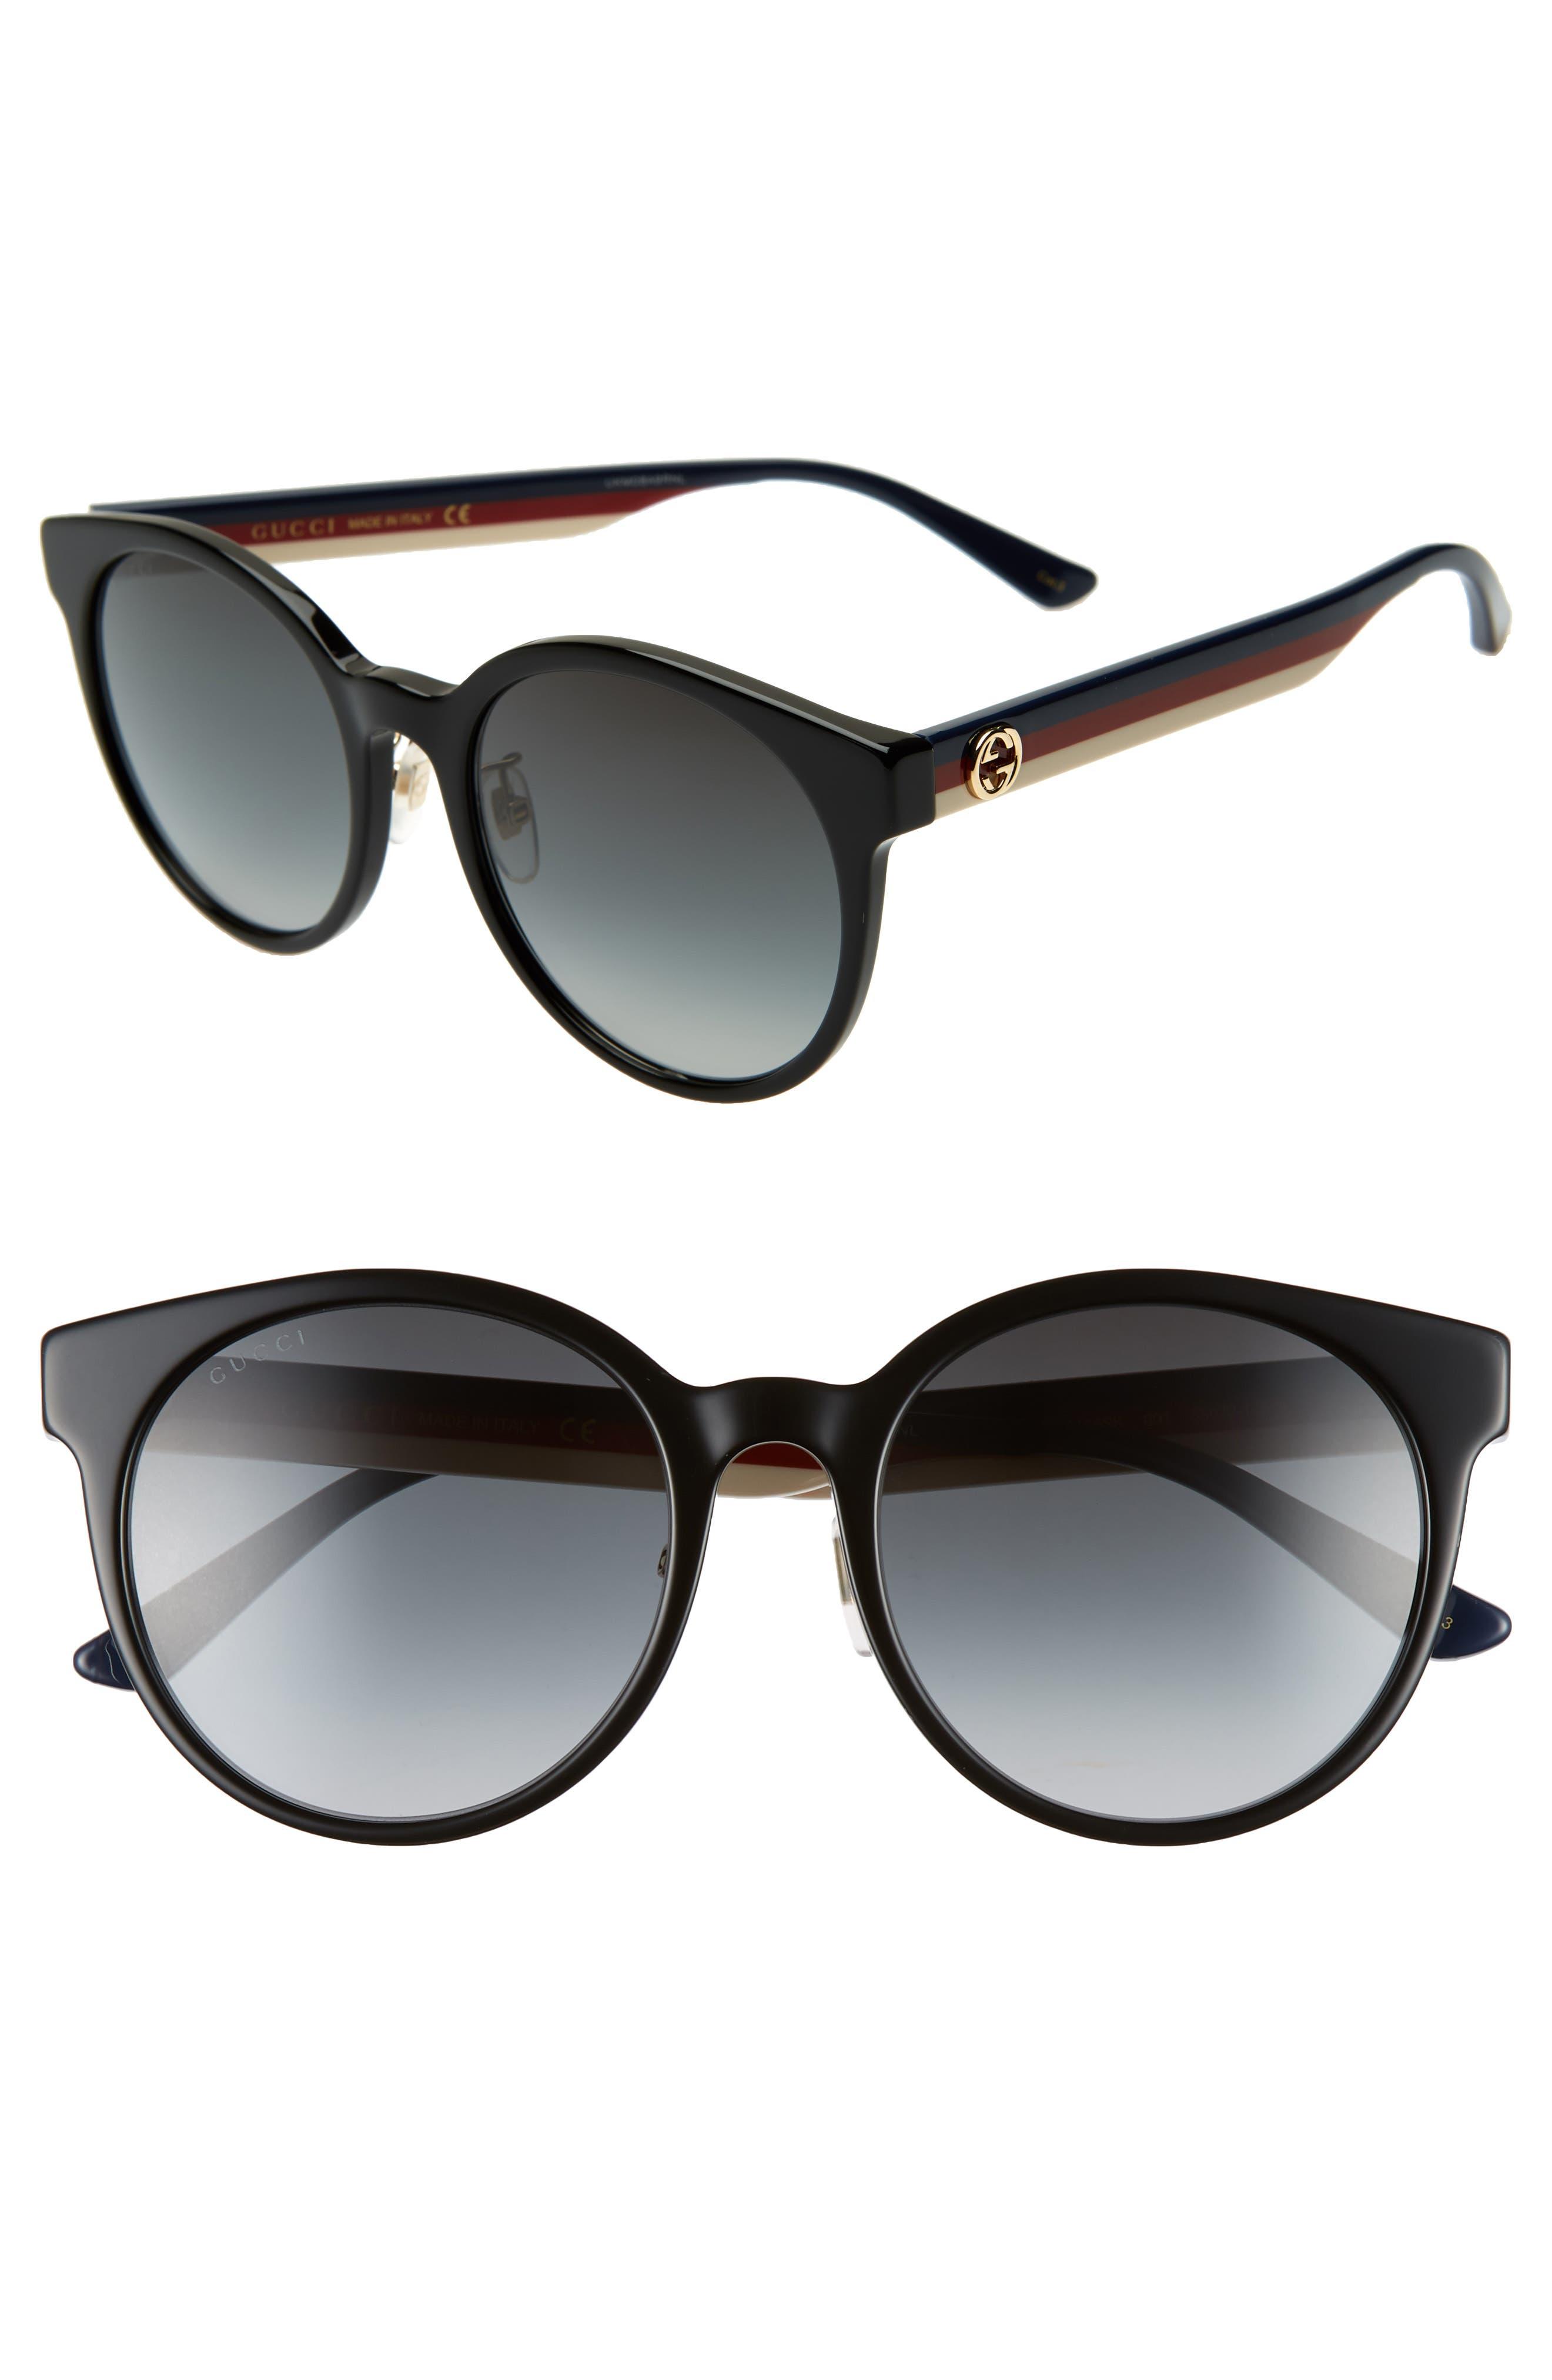 GUCCI, 55mm Round Sunglasses, Main thumbnail 1, color, BLACK/ MULTI/ GREY GRADIENT